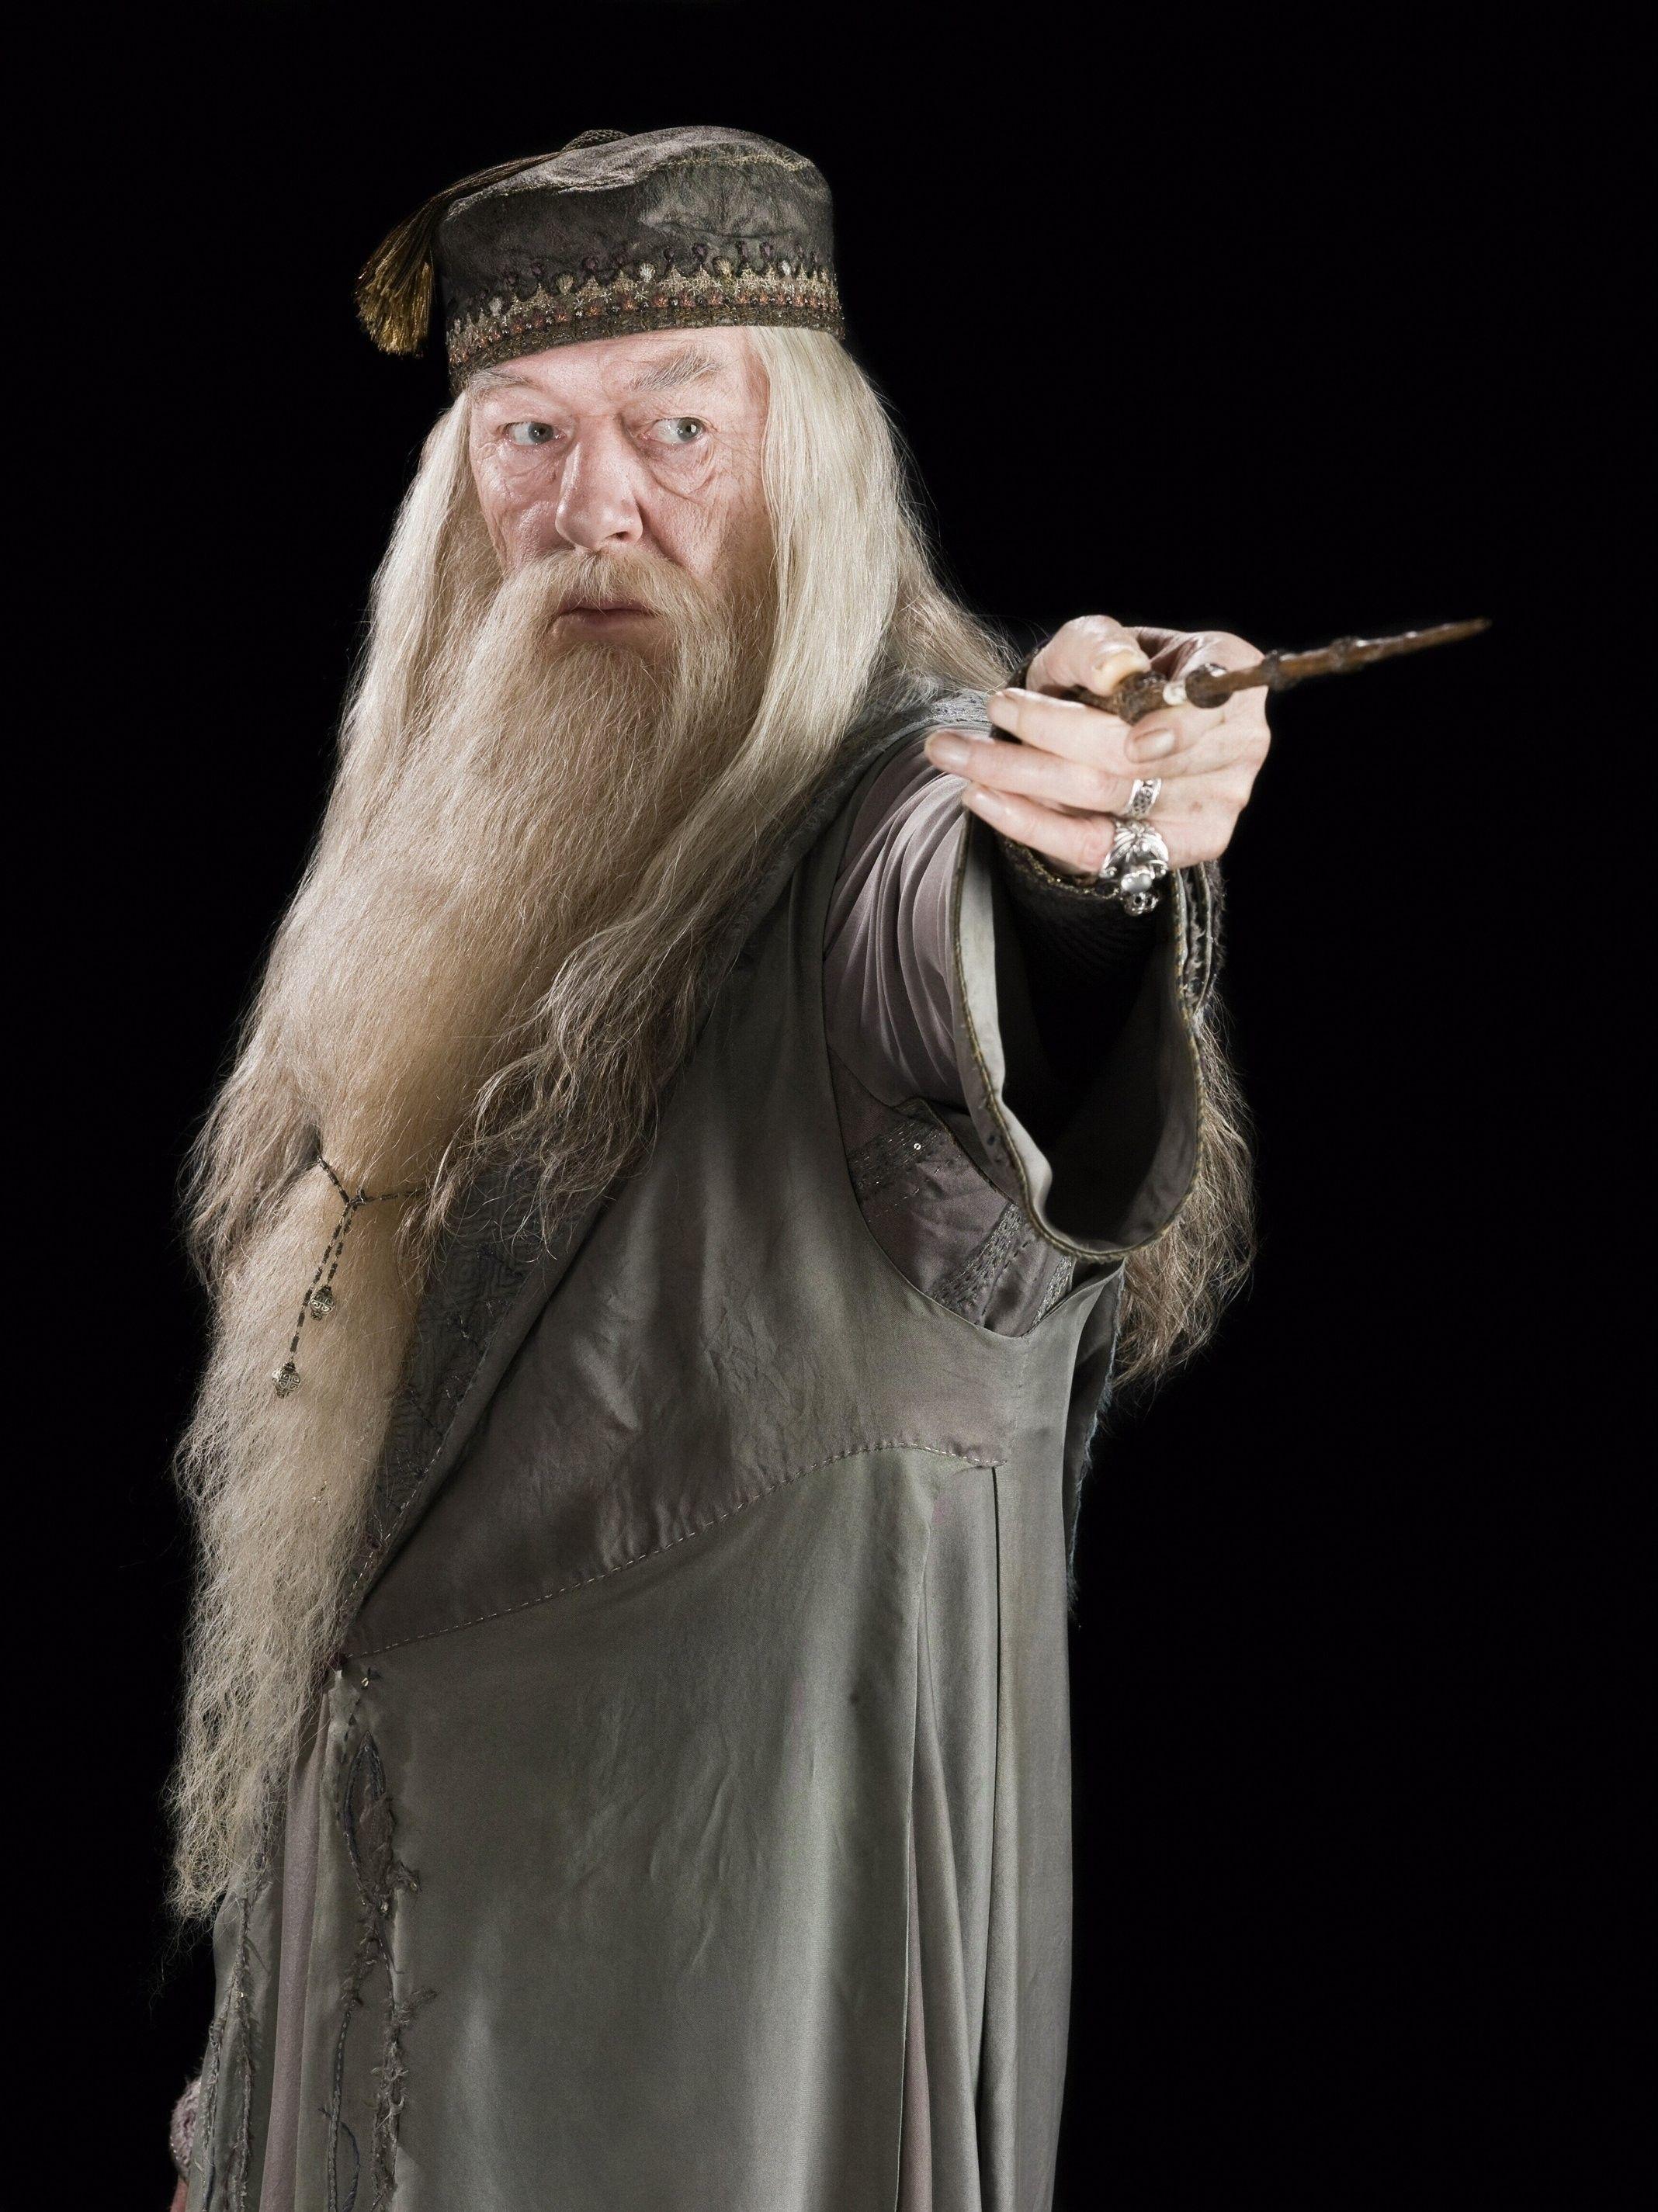 Albus Dumbledore Harry Potter Michael Gambon Actors Cast 2136x2850 Harry Potter Michael Actors Cast Harry Potter World Albus Dumbledore Dumbledore Kostum